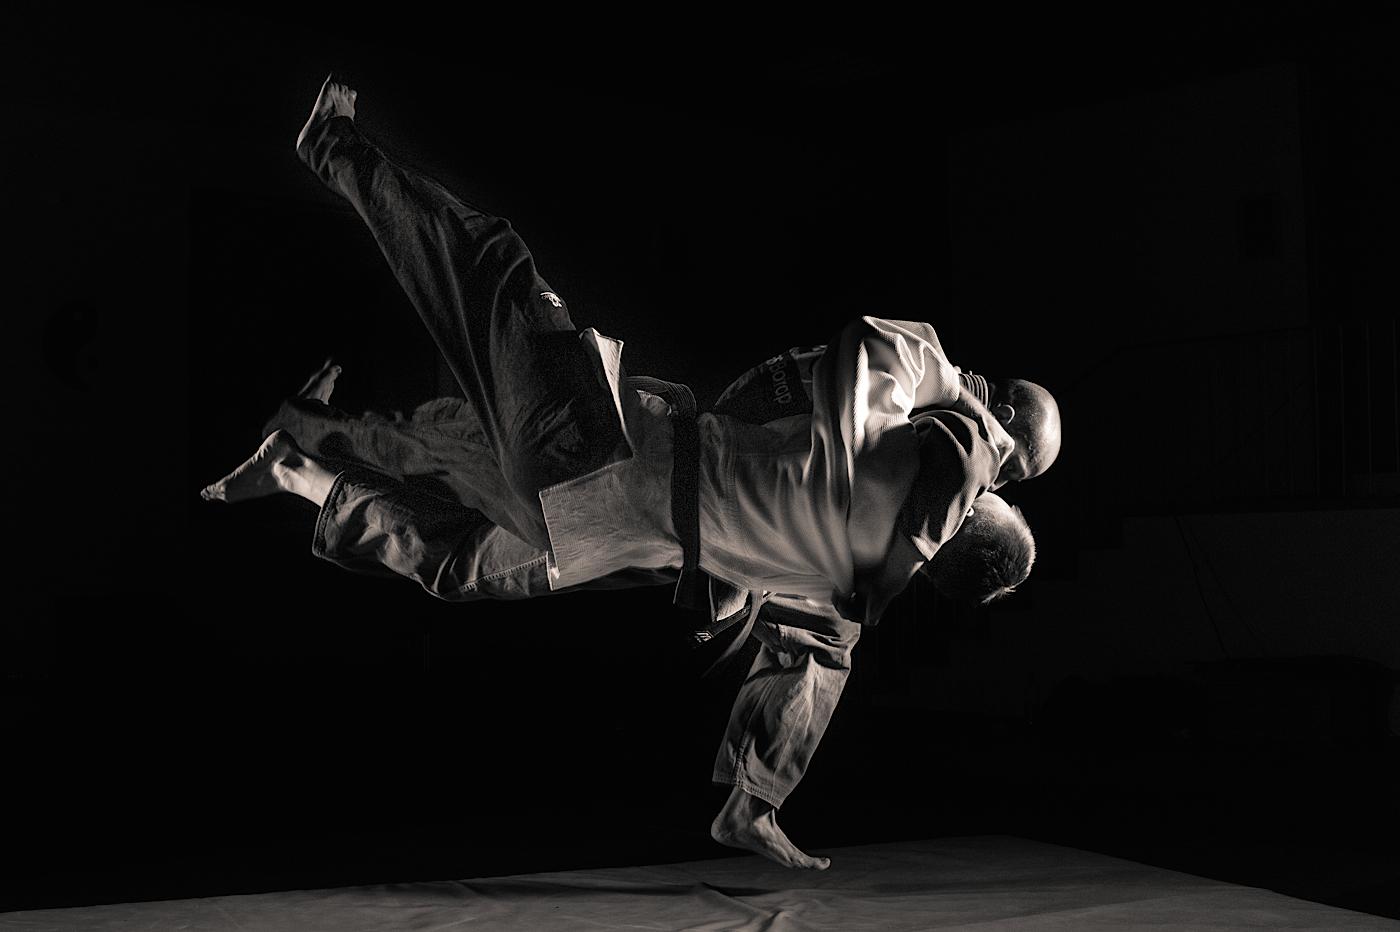 https://i2.wp.com/www.stevehuffphoto.com/wp-content/uploads/2014/03/Judo_MM1.jpg